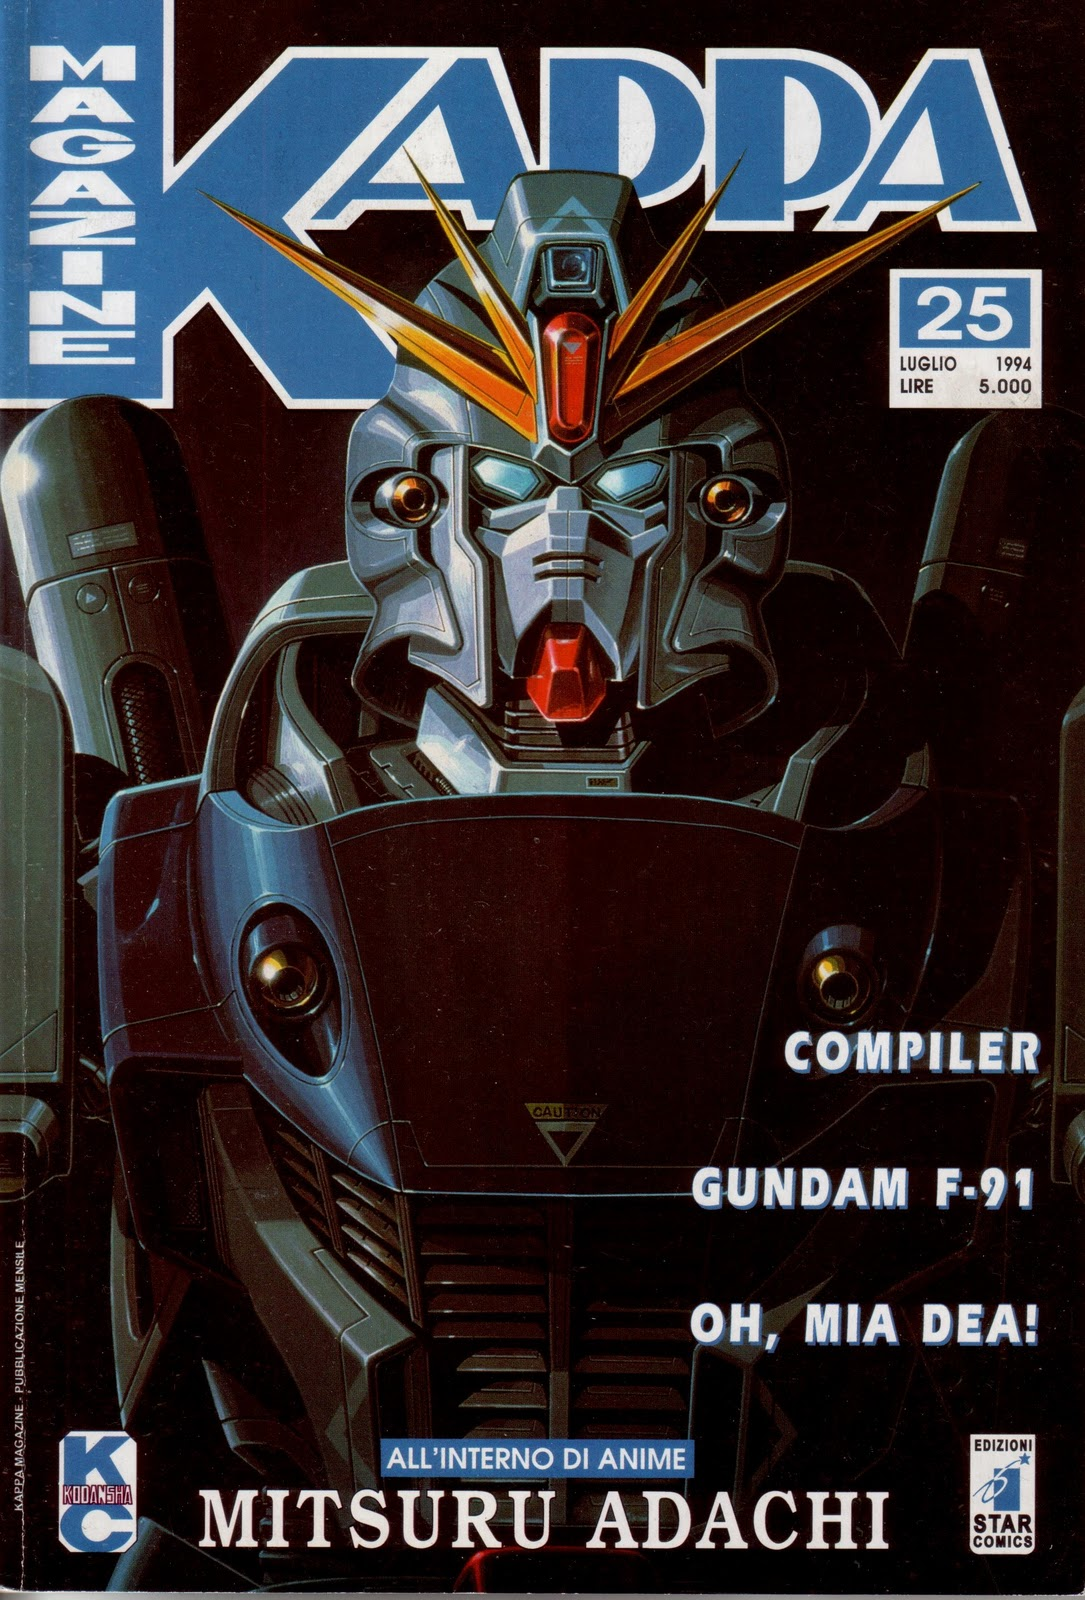 Kappa Magazine Vol 1 25